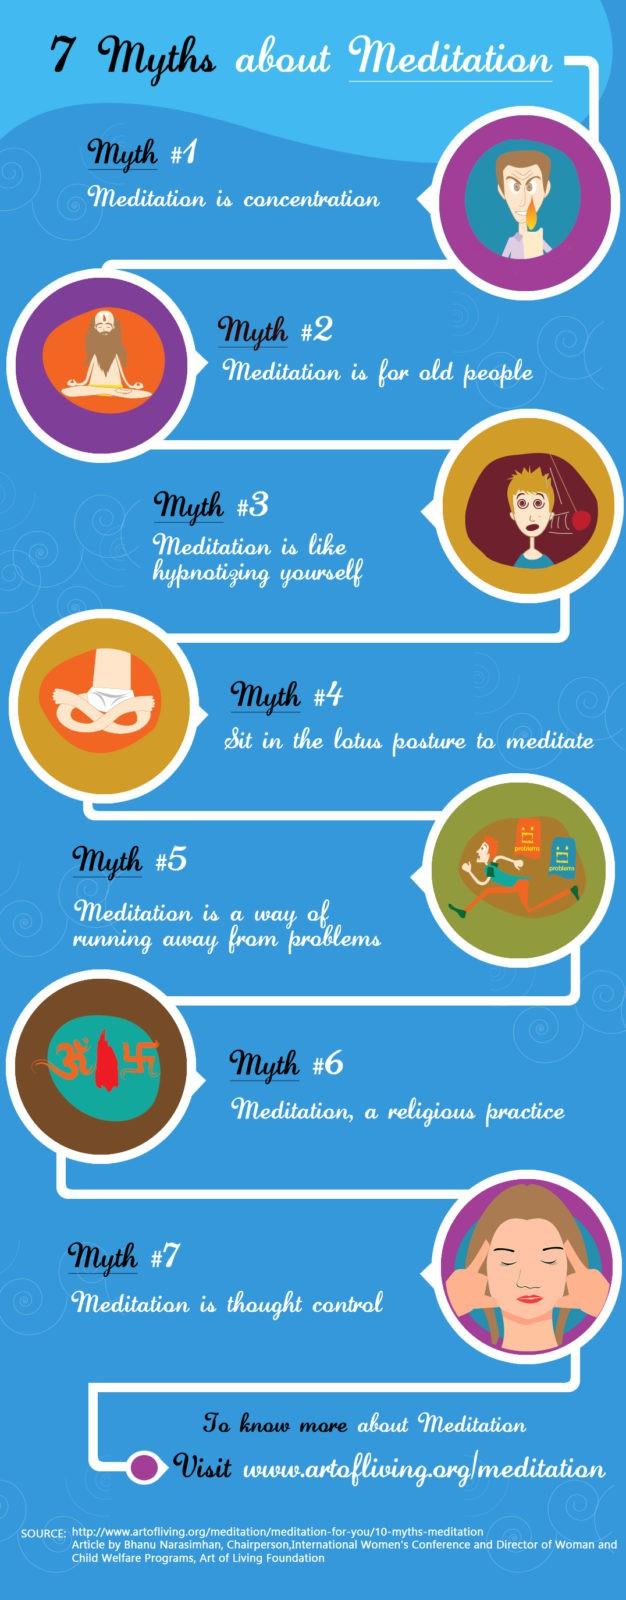 Myths-About-Meditation